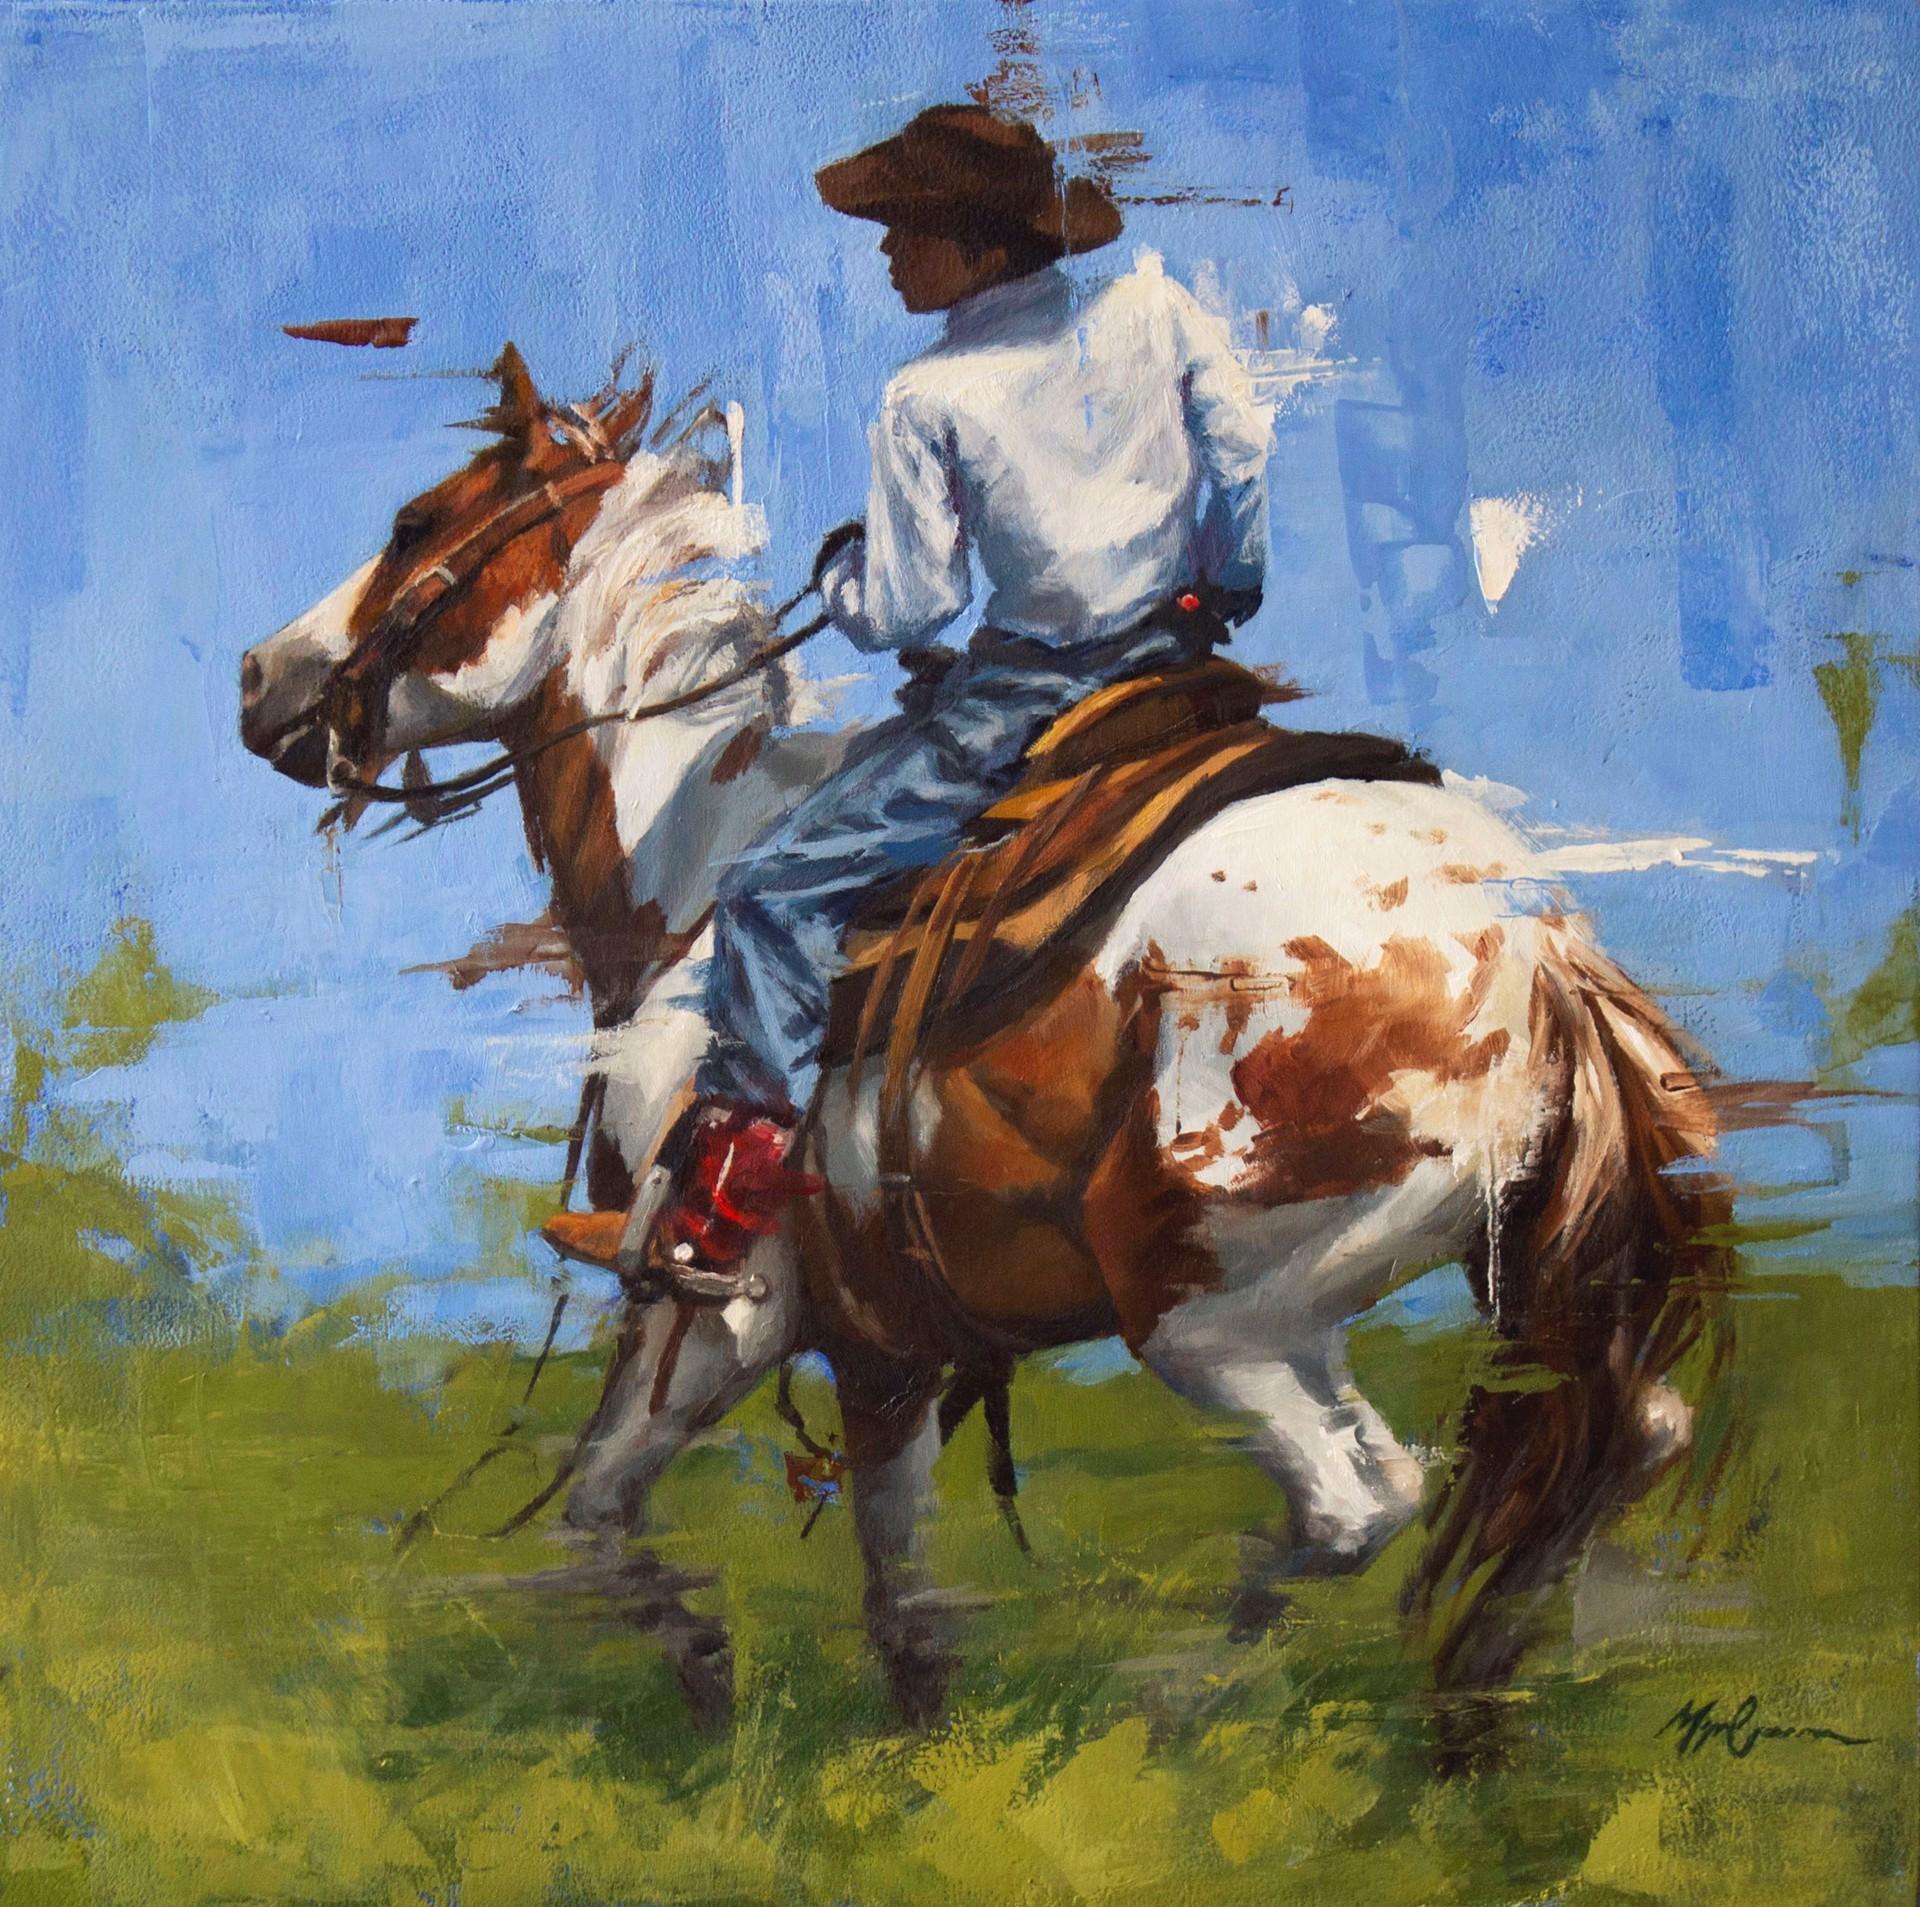 Backcountry Cowhand by Morgan Cameron